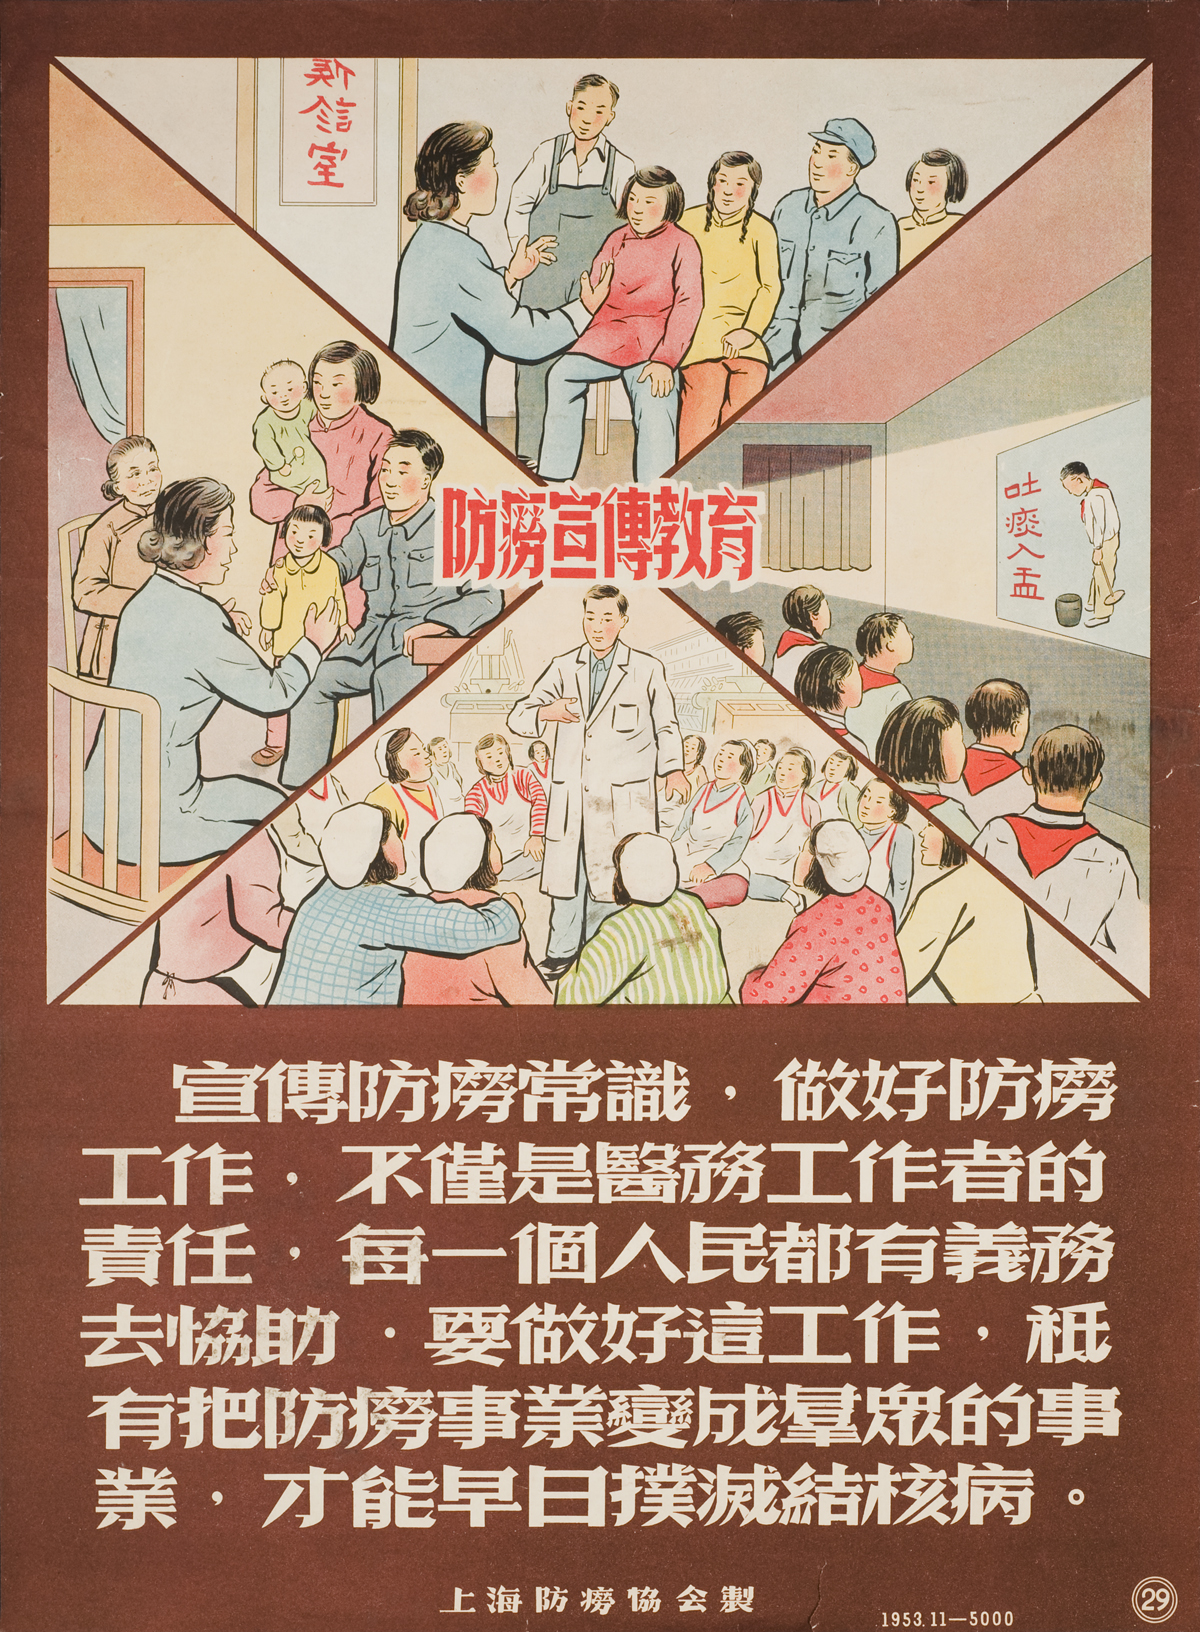 Chinese shanghai 2012 2 - 1 part 3